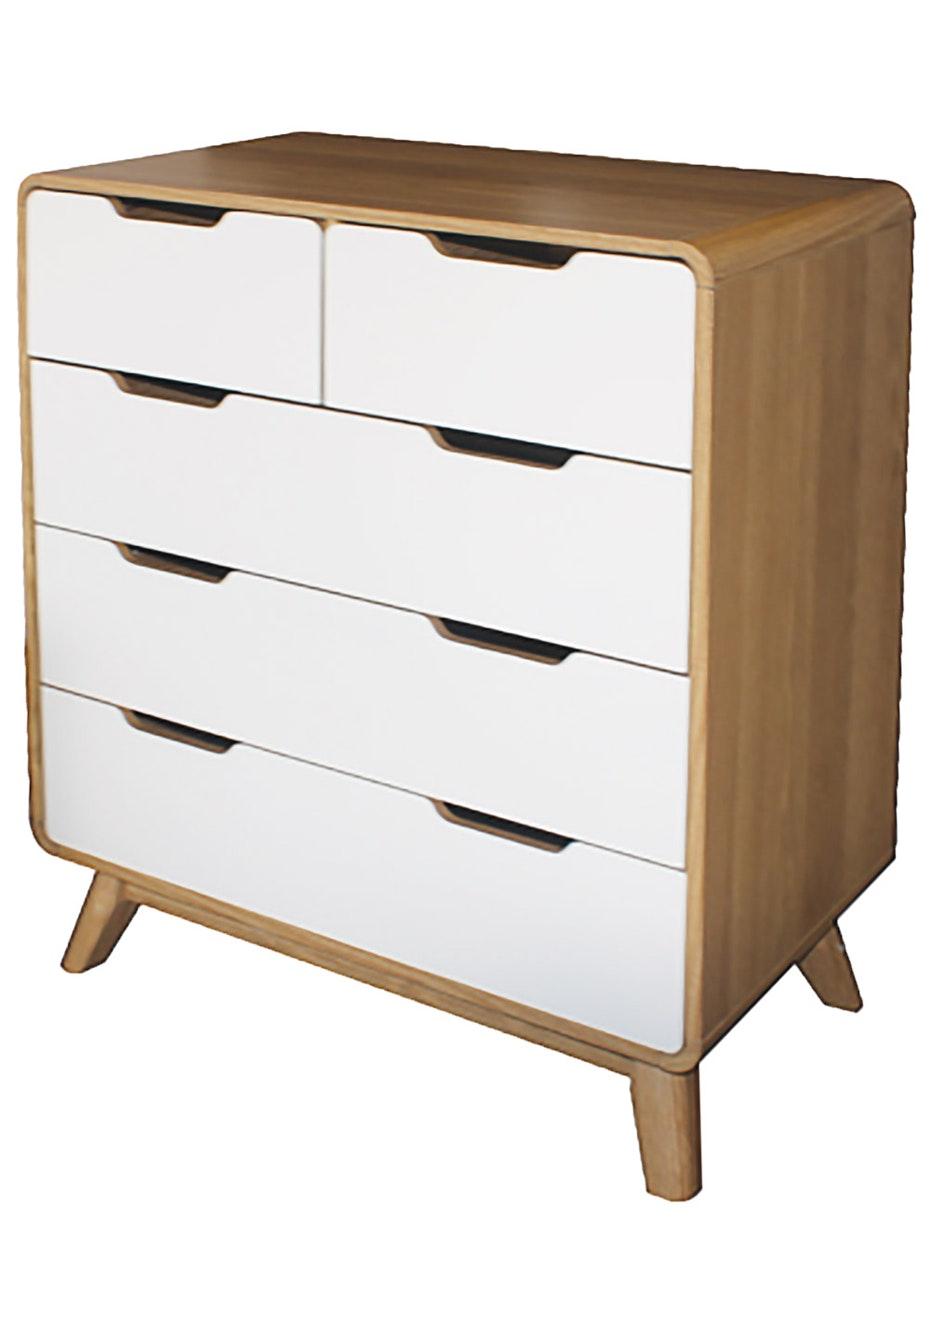 furniture save. Big Save Furniture - Retro Chest Oak/White Scandi Inspired Onceit